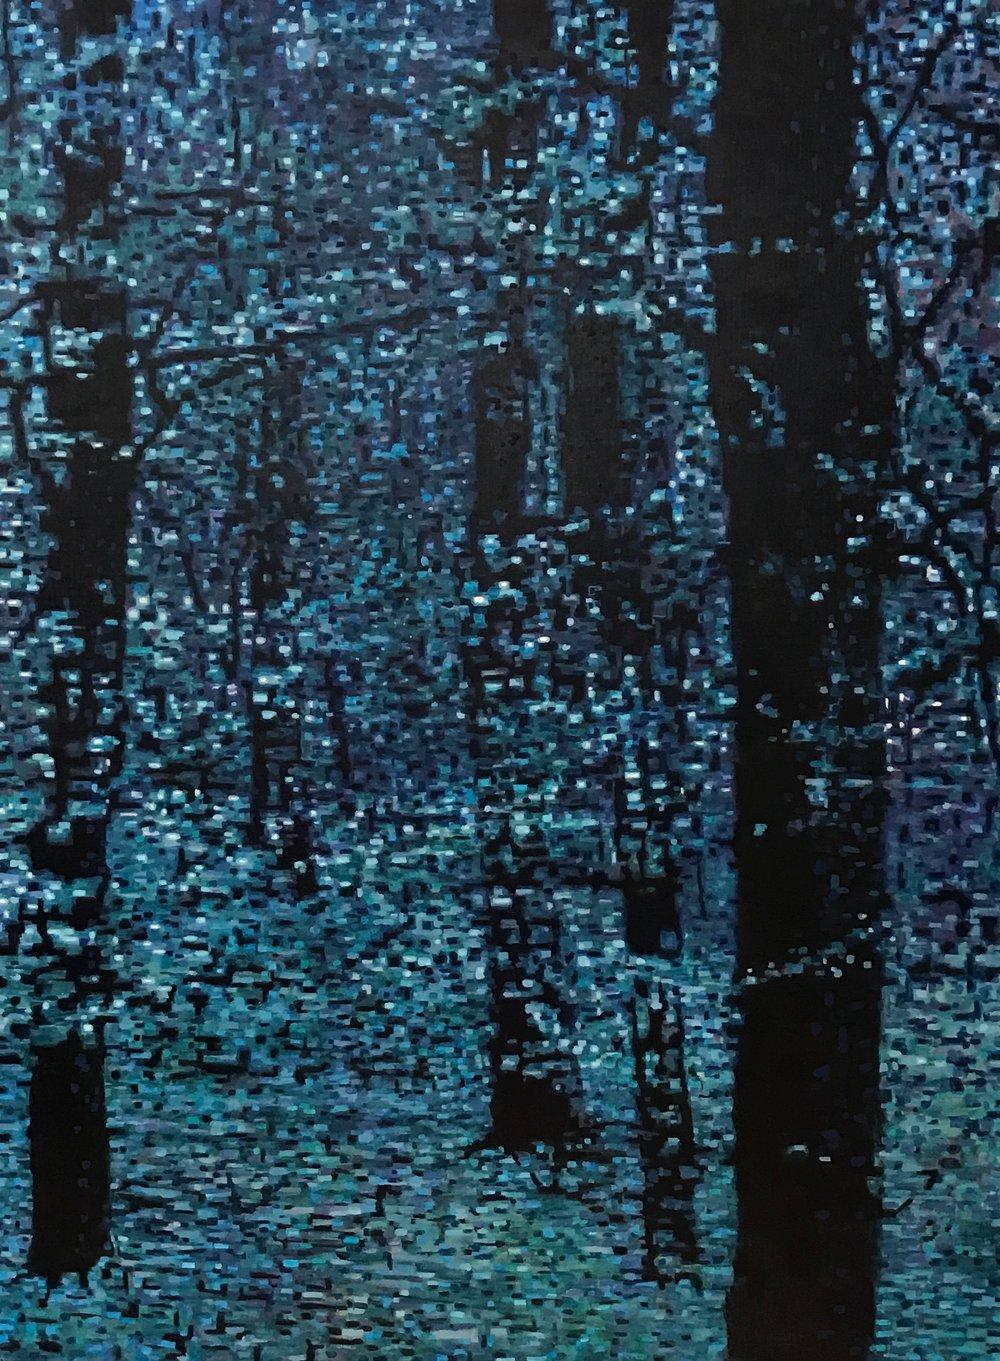 "Forest Moonlight, Oil on Linen, 36"" x 48"", 2014"